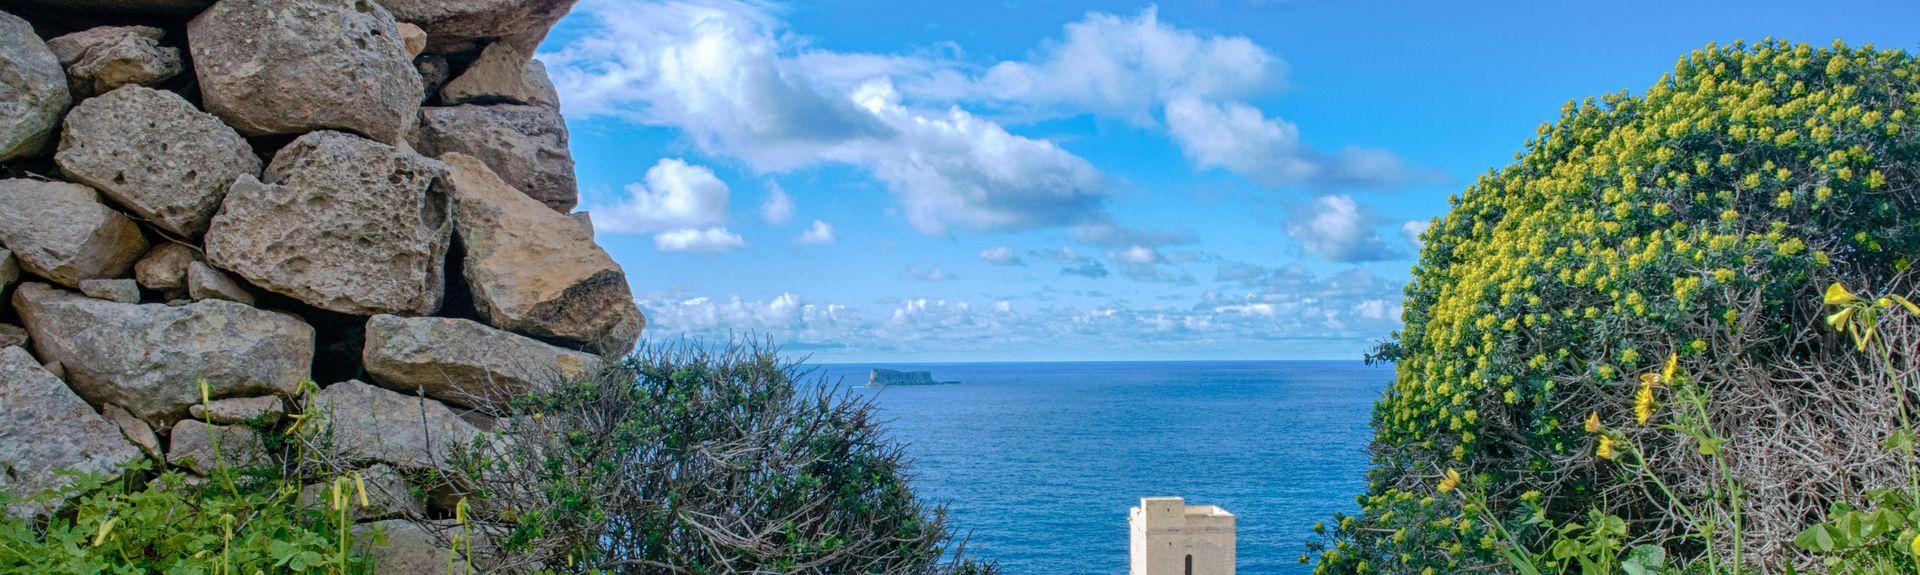 Mgarr ix-Xini, Malta